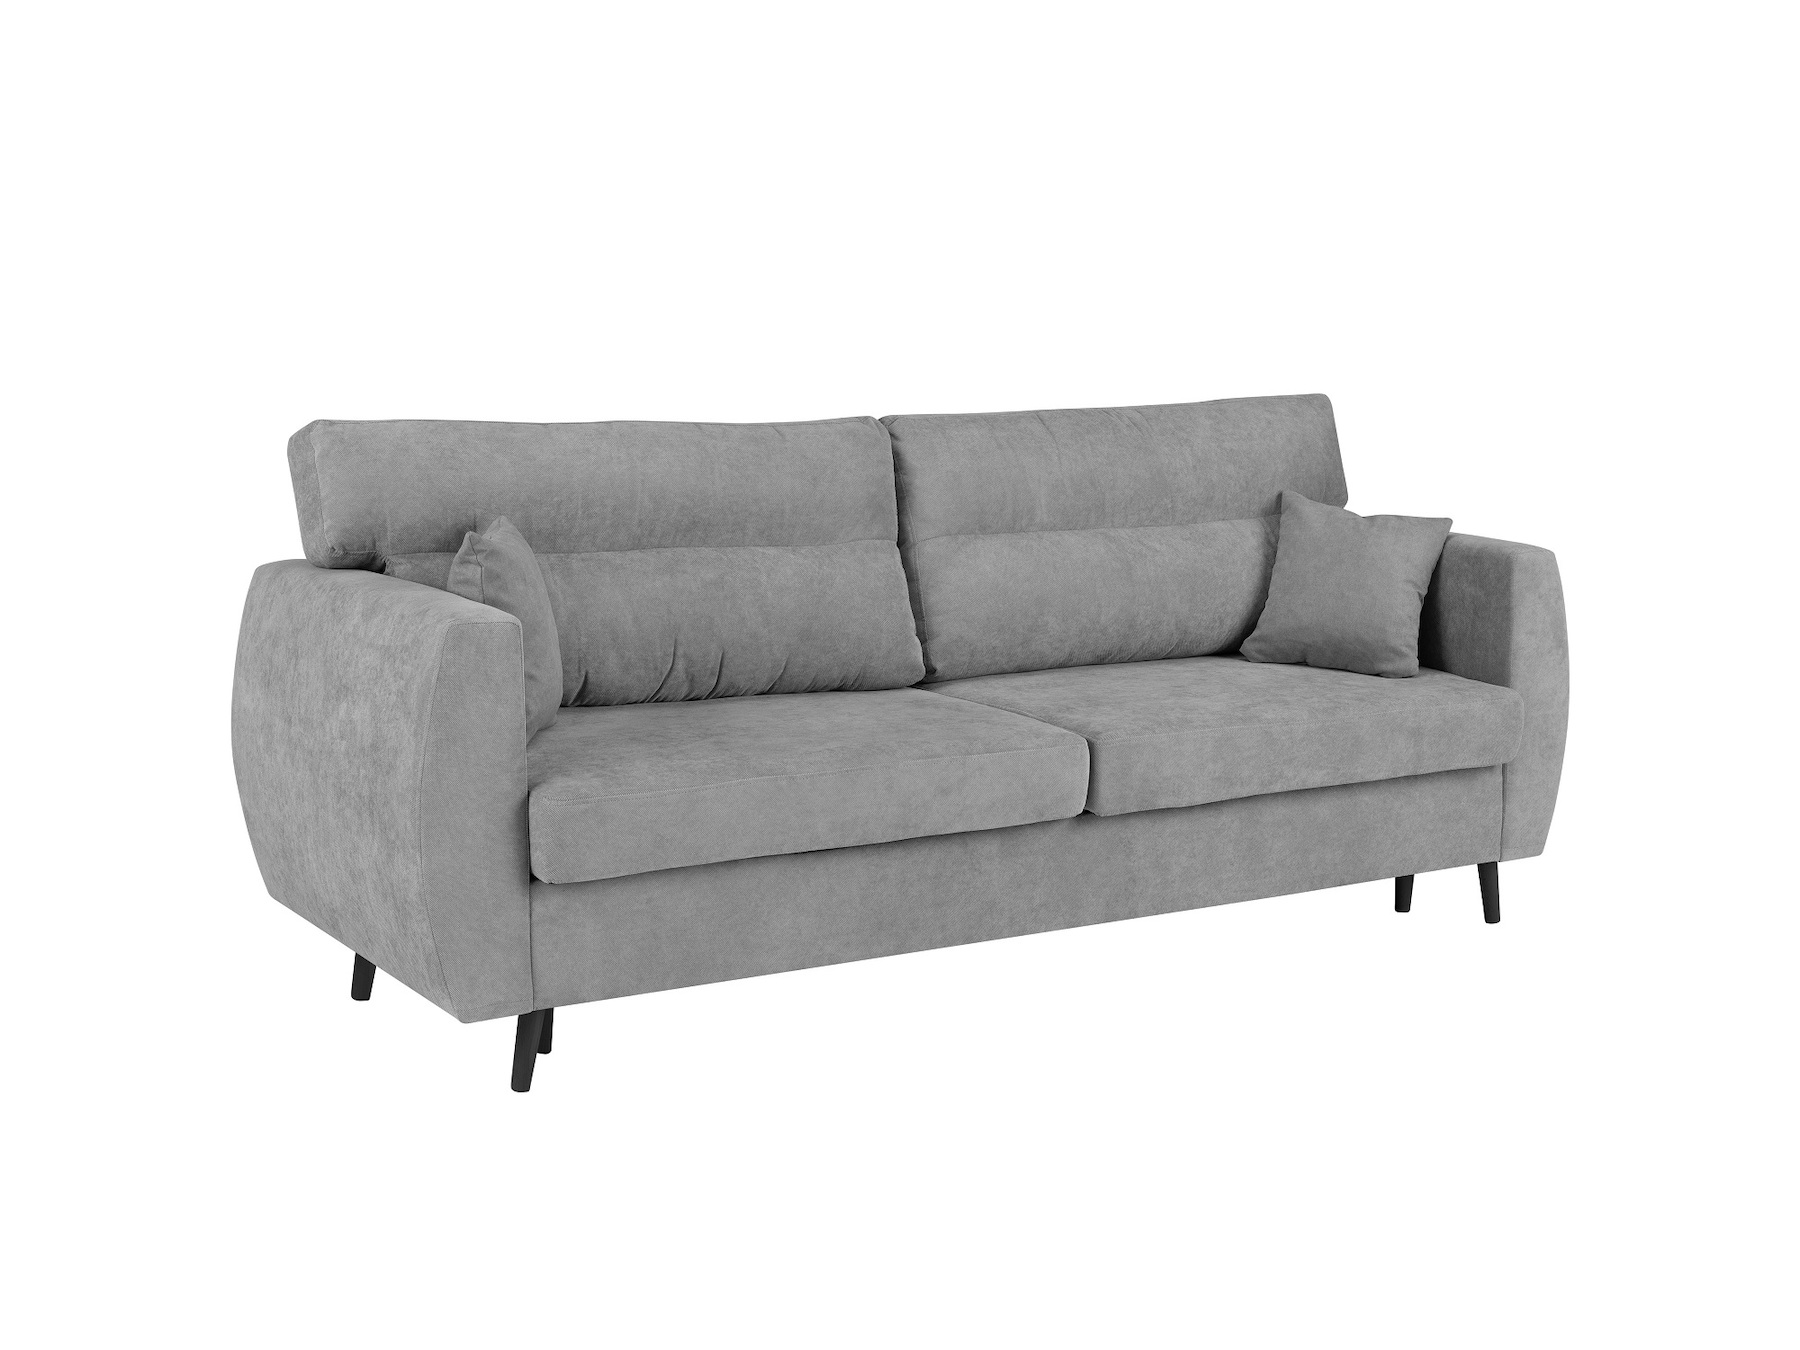 Full Size of Sofa Louisiana (3 Sitzer Mit Polster Grau) Ikea 3 Sitzer Grau Schlaffunktion Leder Couch Samt 3 Sitzer Nino Schwarz/grau Rattan 2 Und Retro Kingsley Anabel Sofa Sofa 3 Sitzer Grau